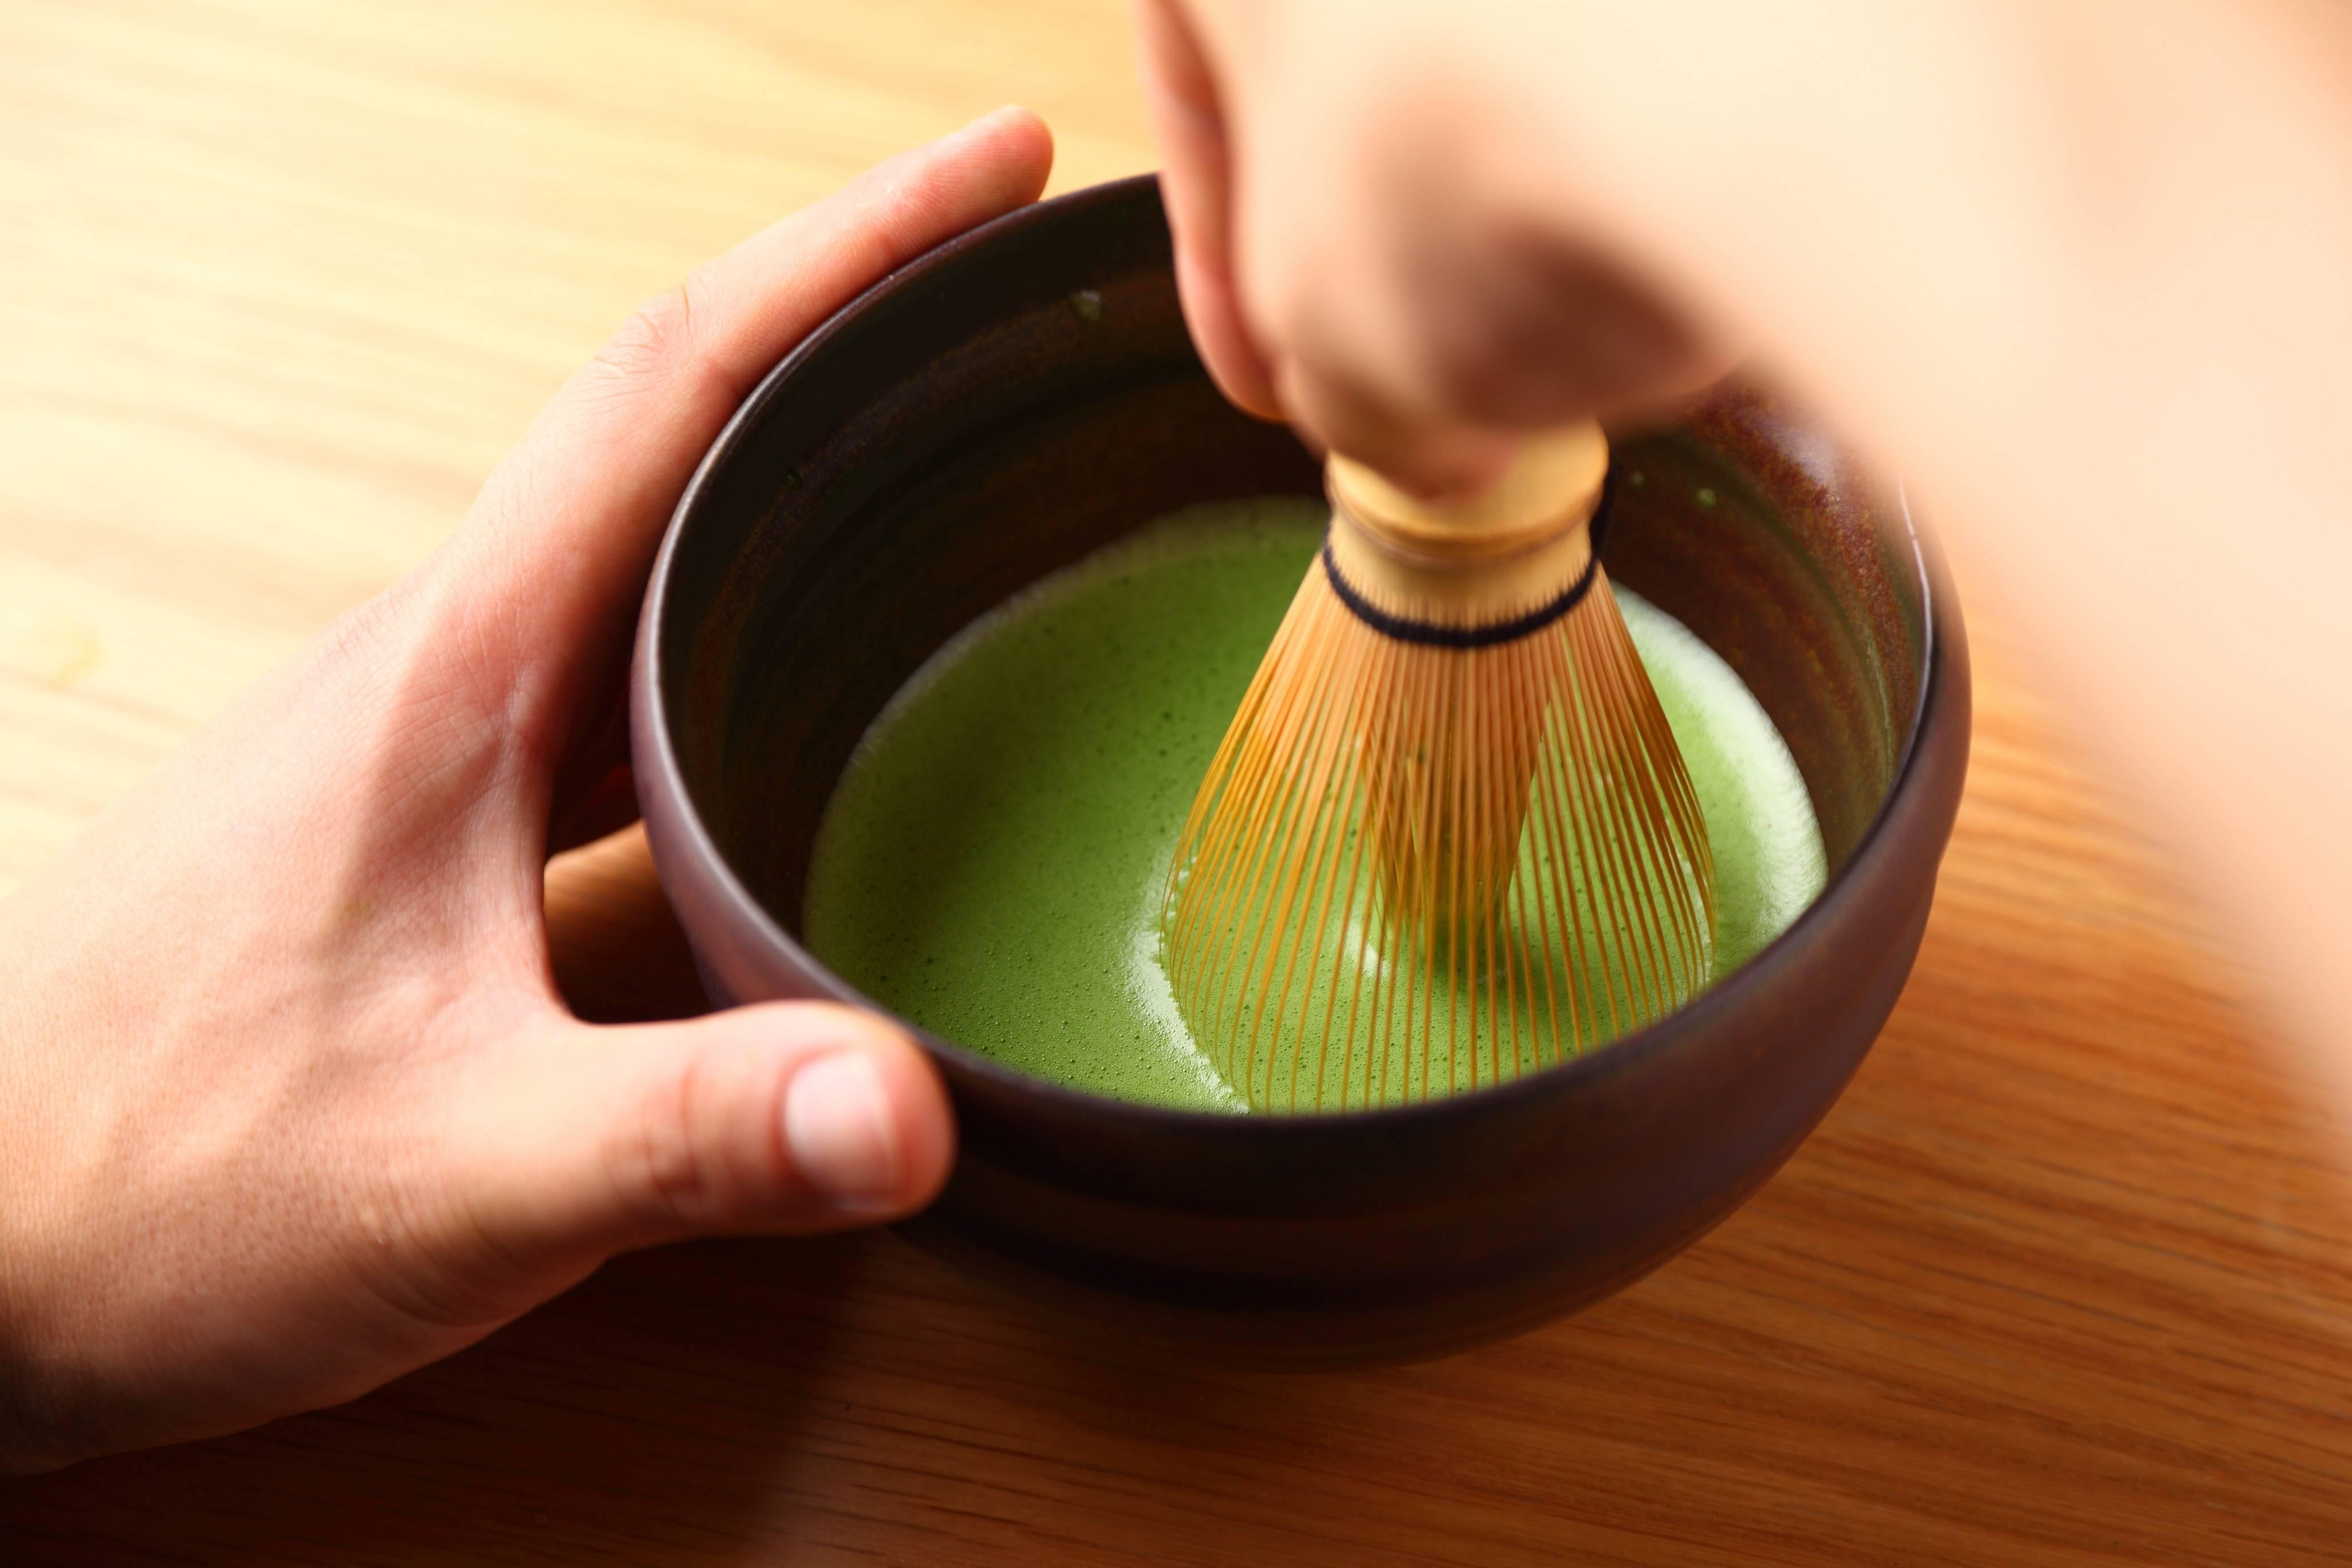 So – Matcha Tea making